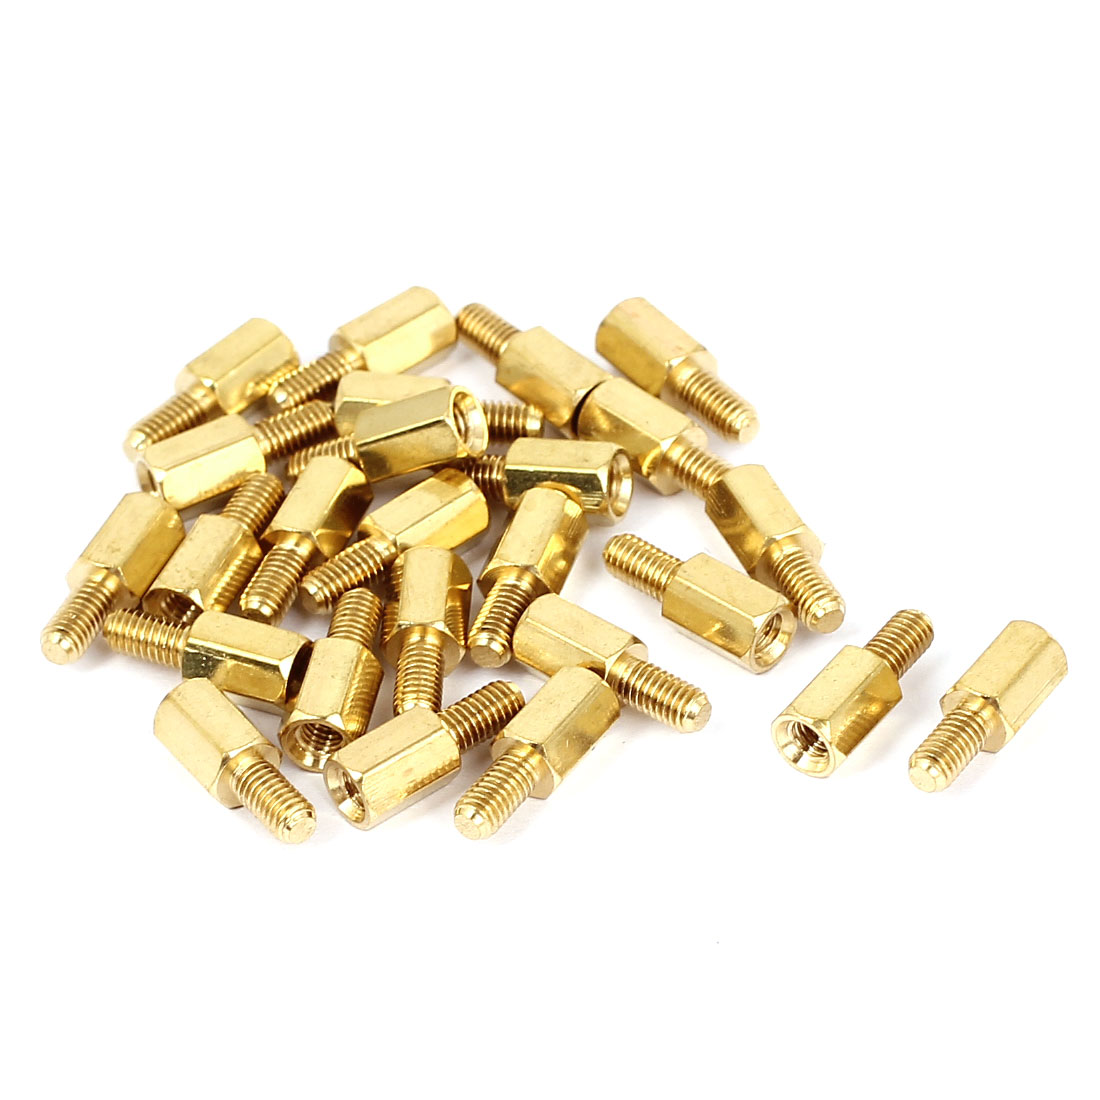 M3x7+6mm Female/Male Threaded Brass Hex Standoff Pillar Spacer Coupler Nut 25pcs